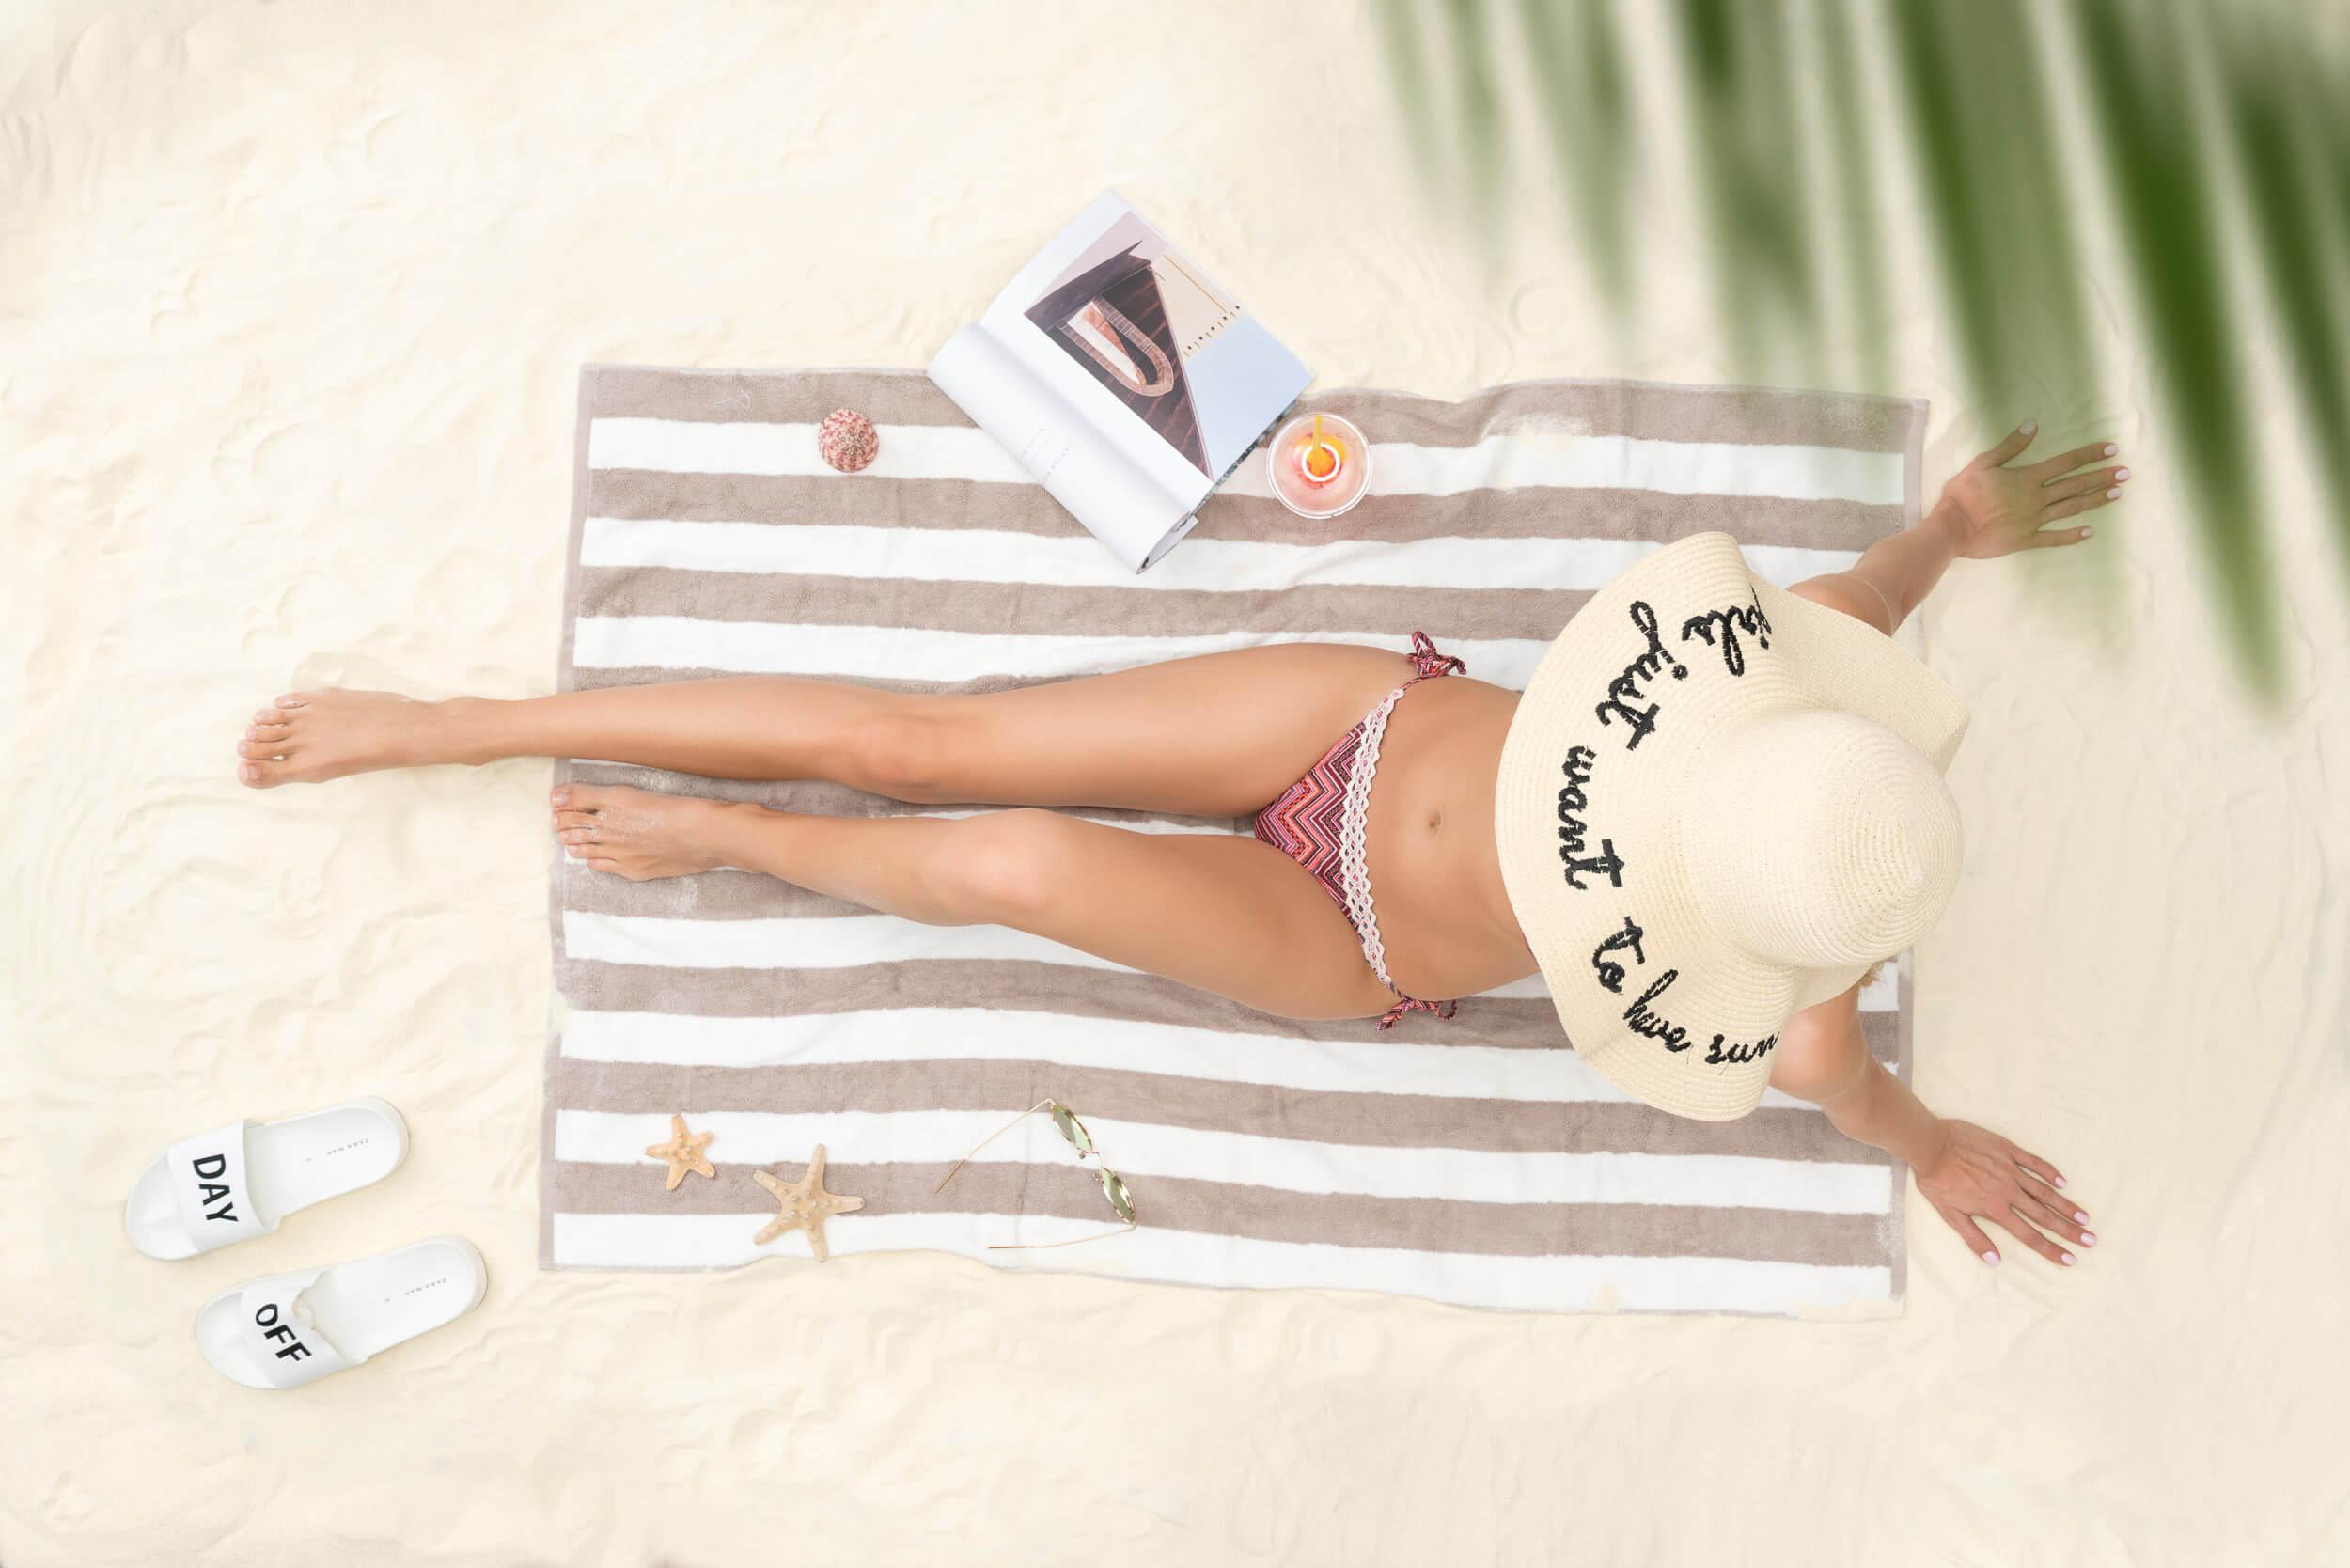 ckanani-young-girl-in-a-sun-hat.jpg